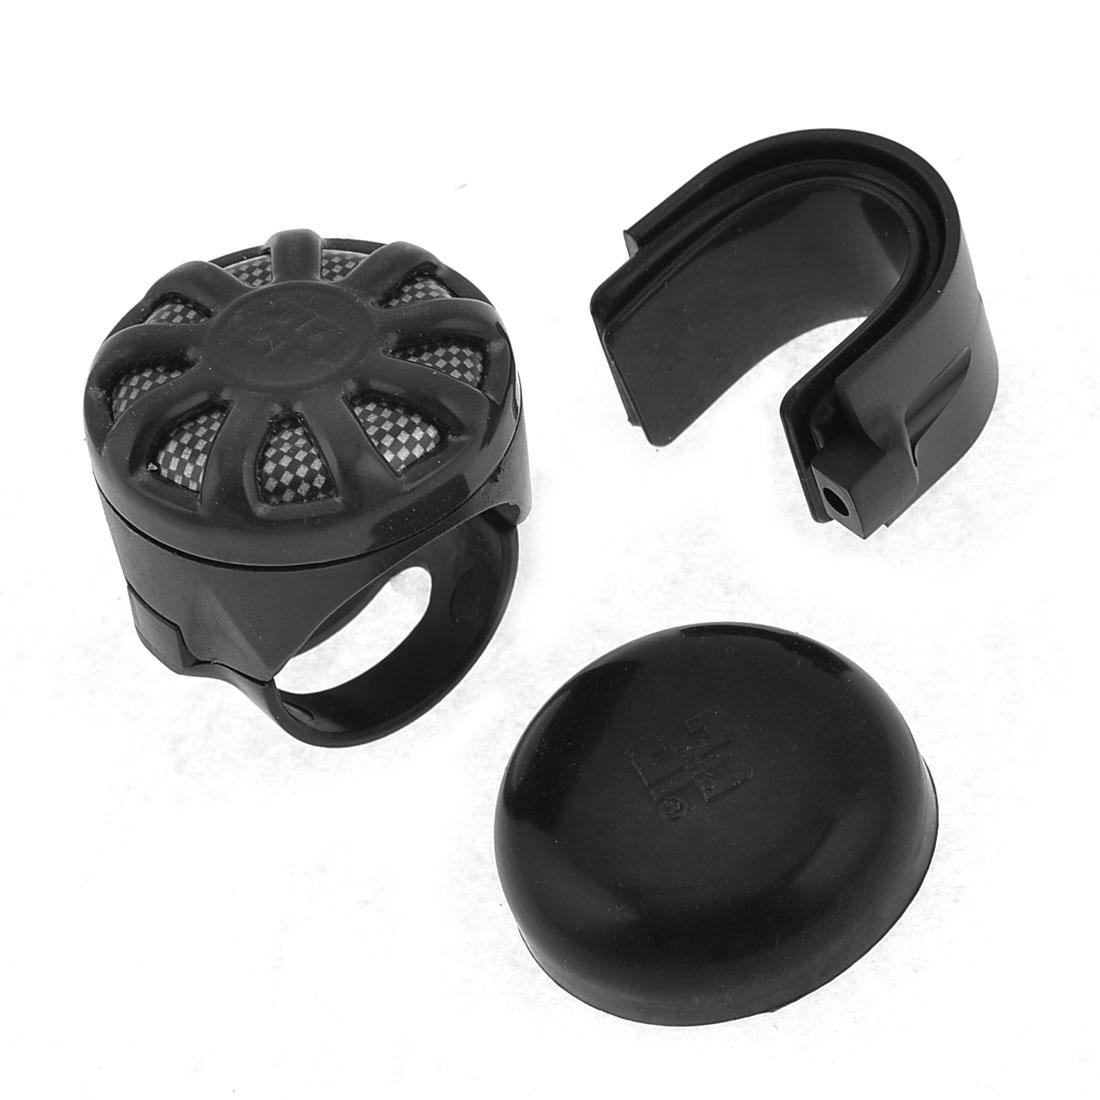 Carbon Fiber Print Car Power Handle Steering Wheel Spinner Knob Black